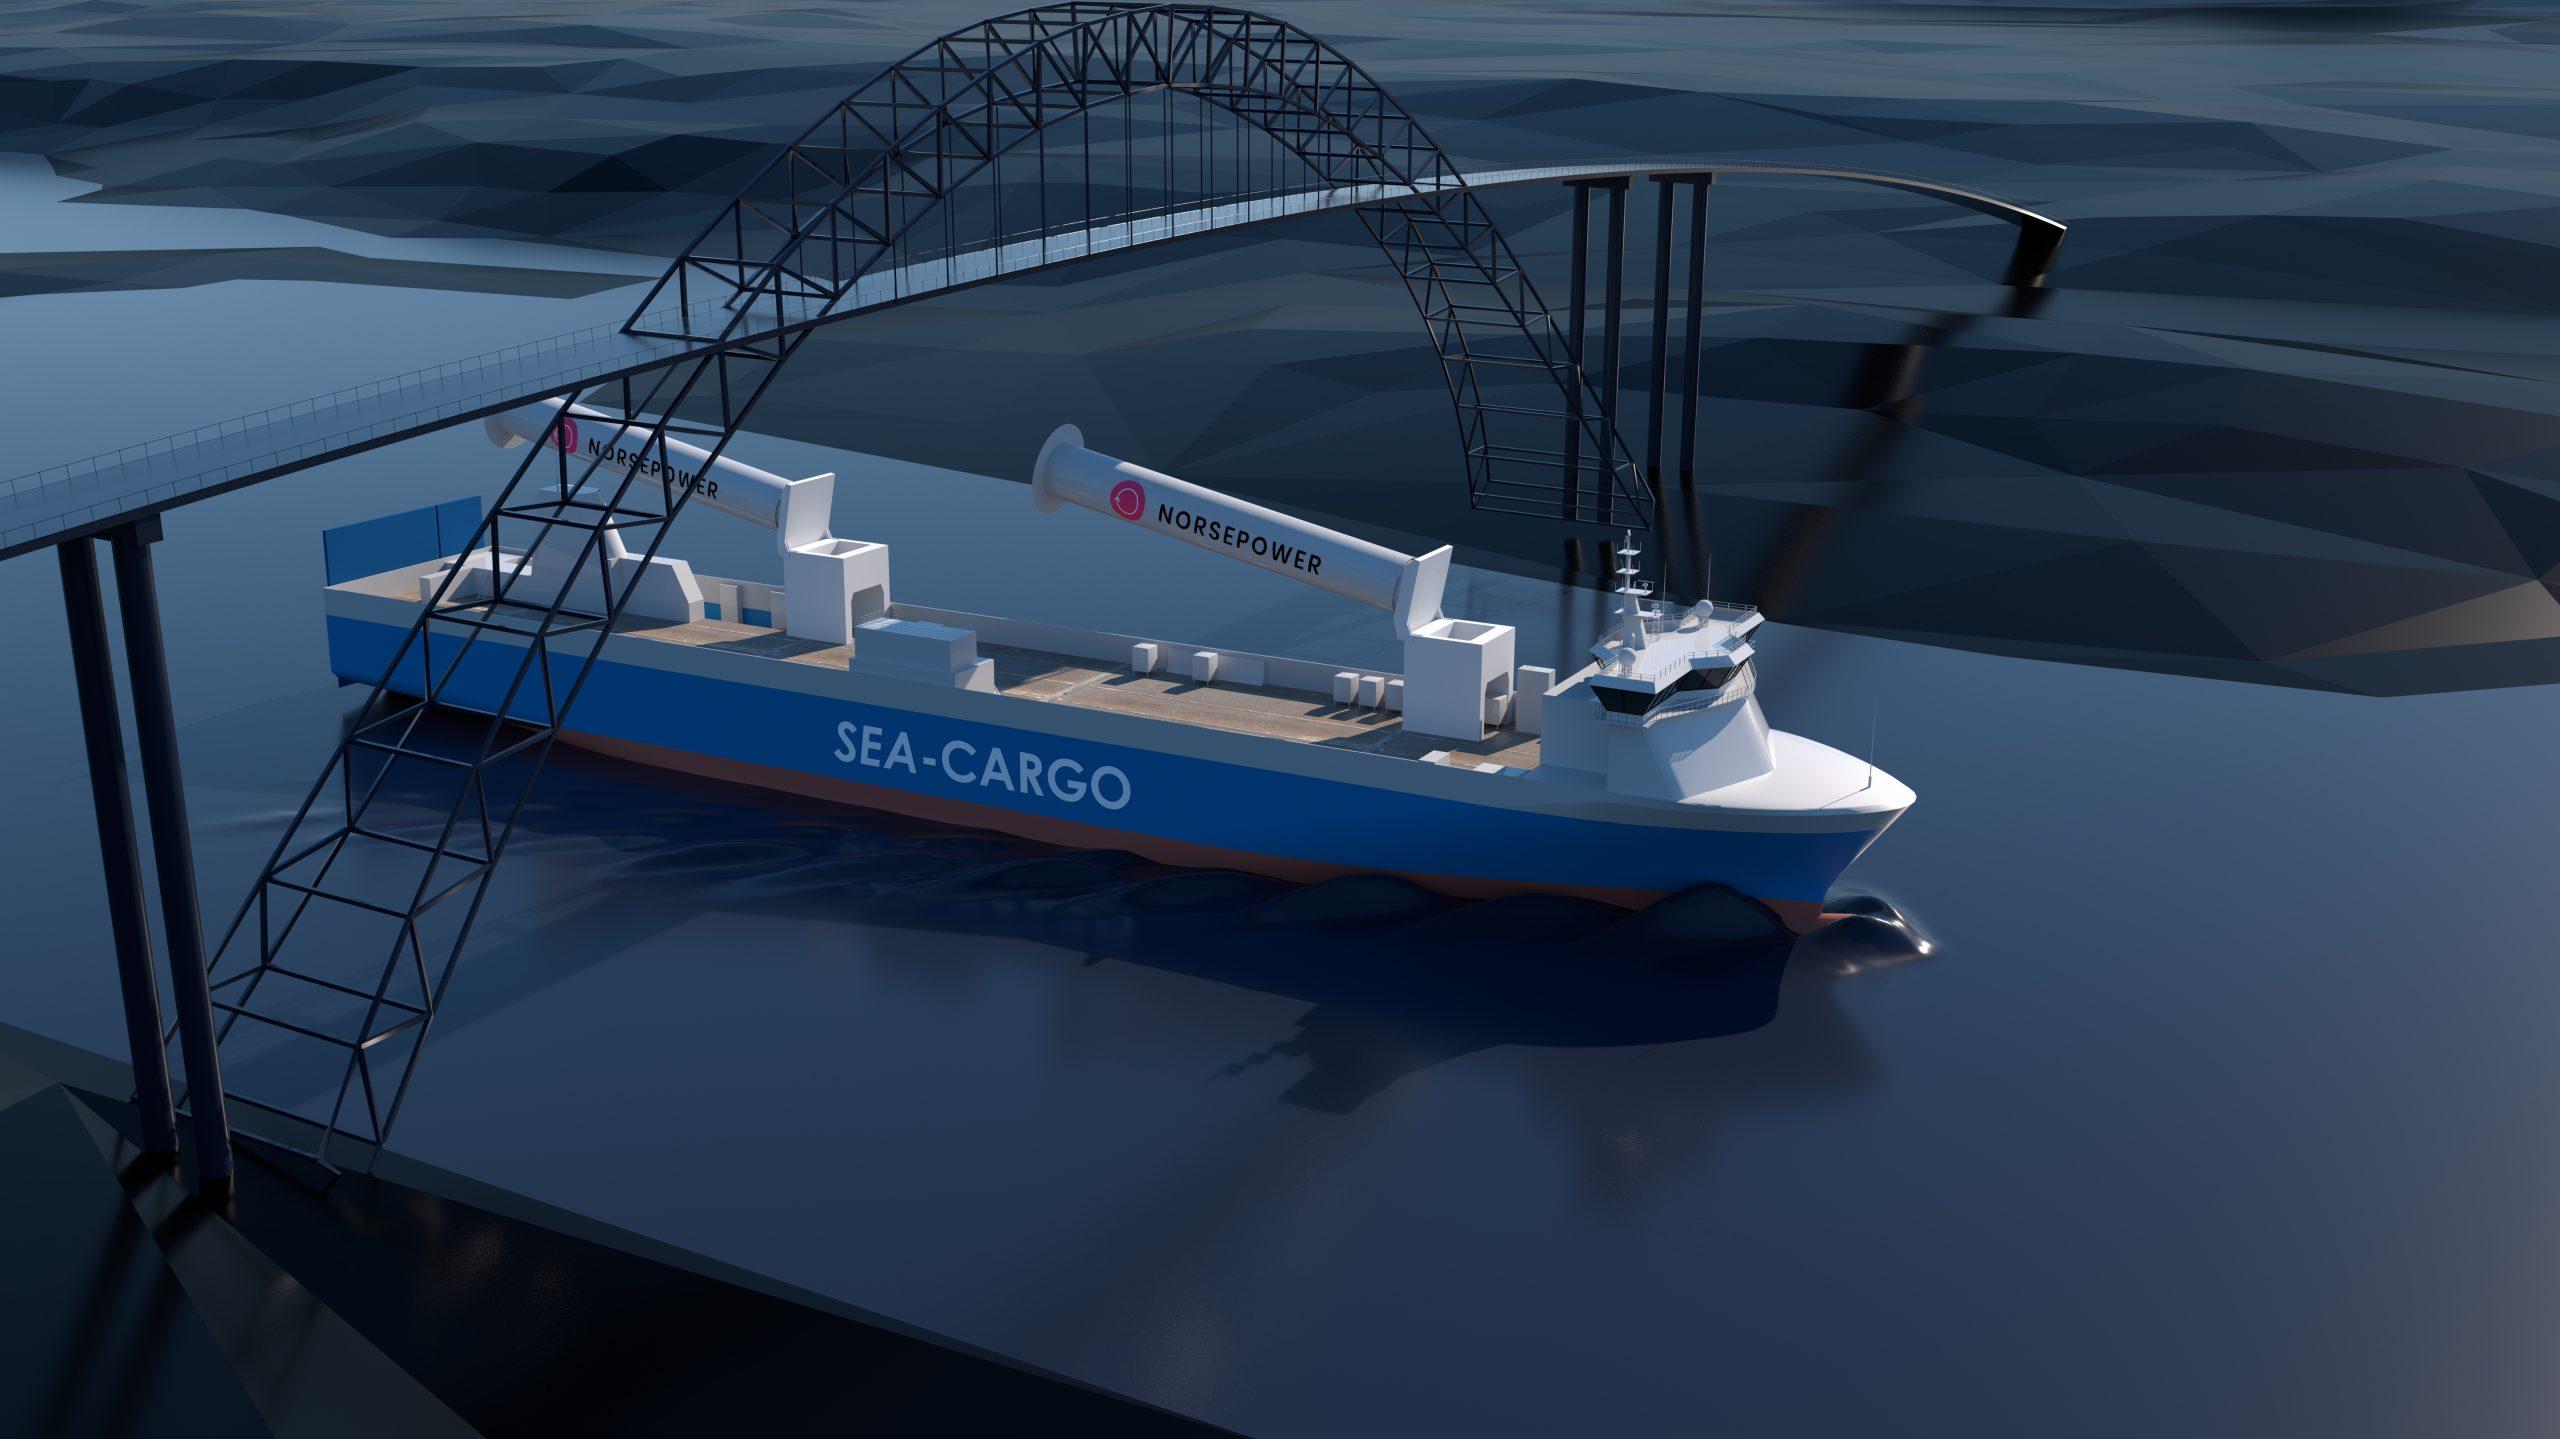 zeilschip, rotoren, brug, sea cargo